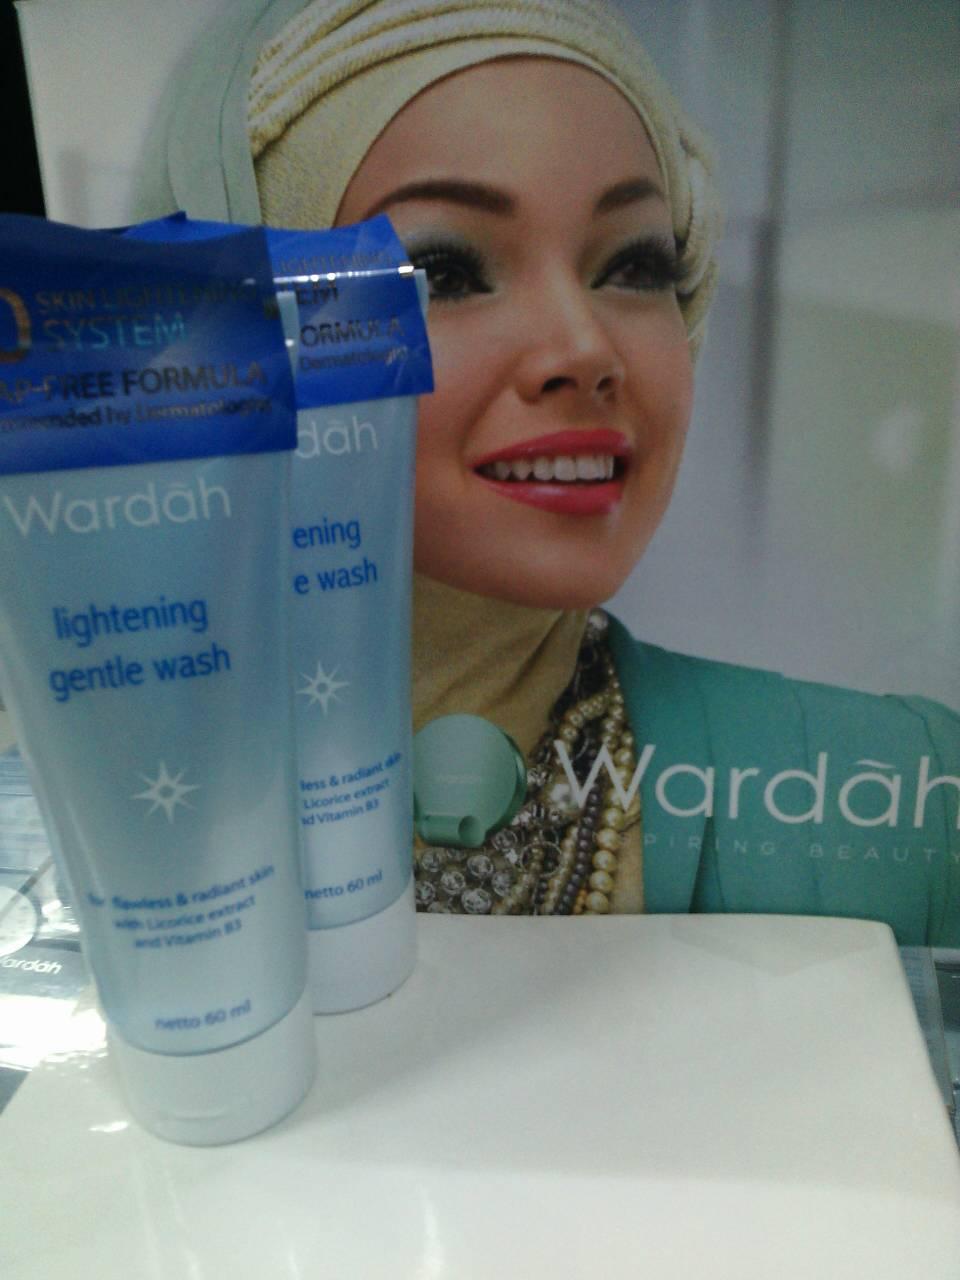 Jual Lightening Gentle Wash Wardah Ld Shopkosmetik Tokopedia Grntle